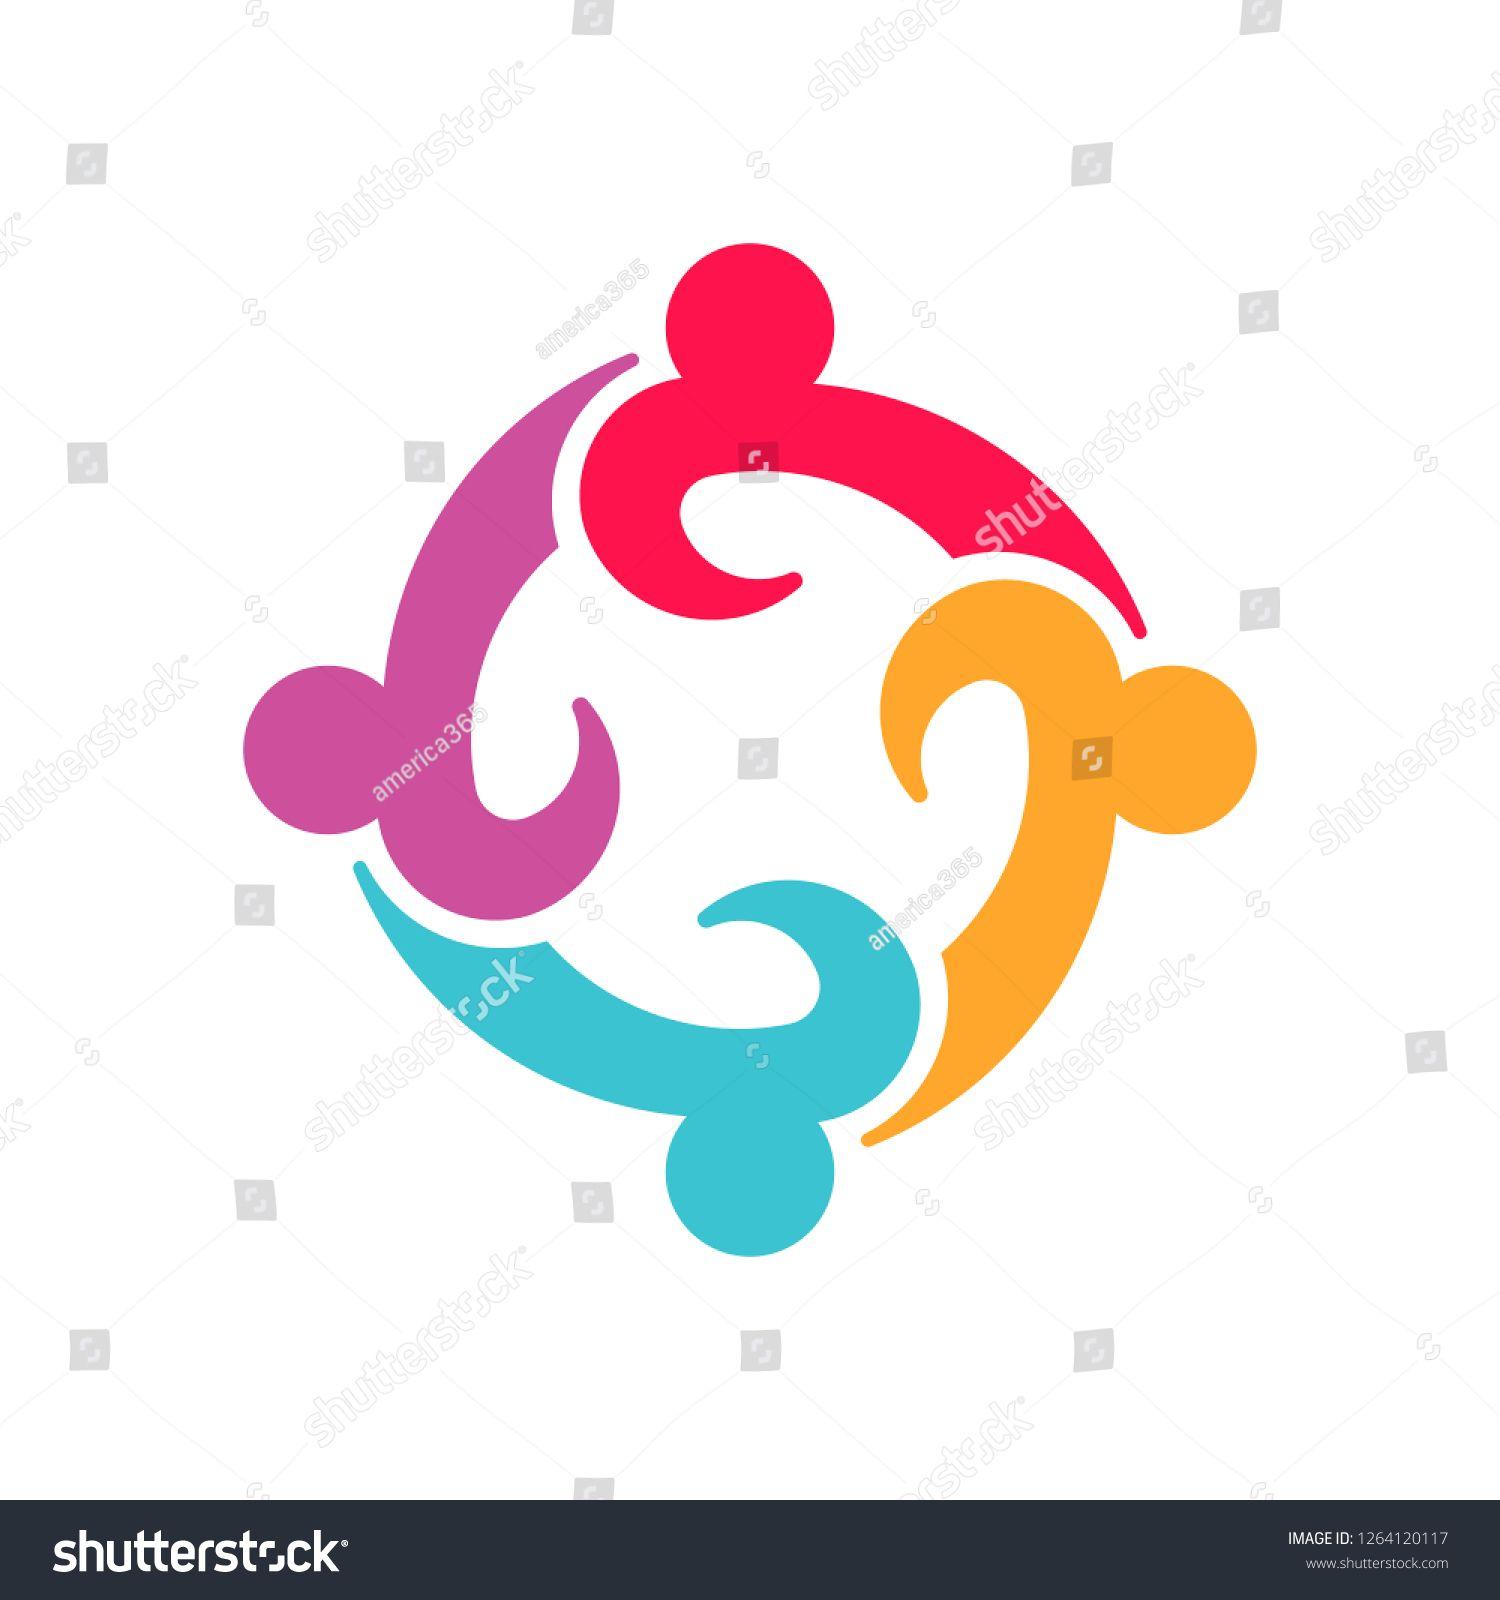 Four Entrepreneurs teamwork people logo design #team #people.